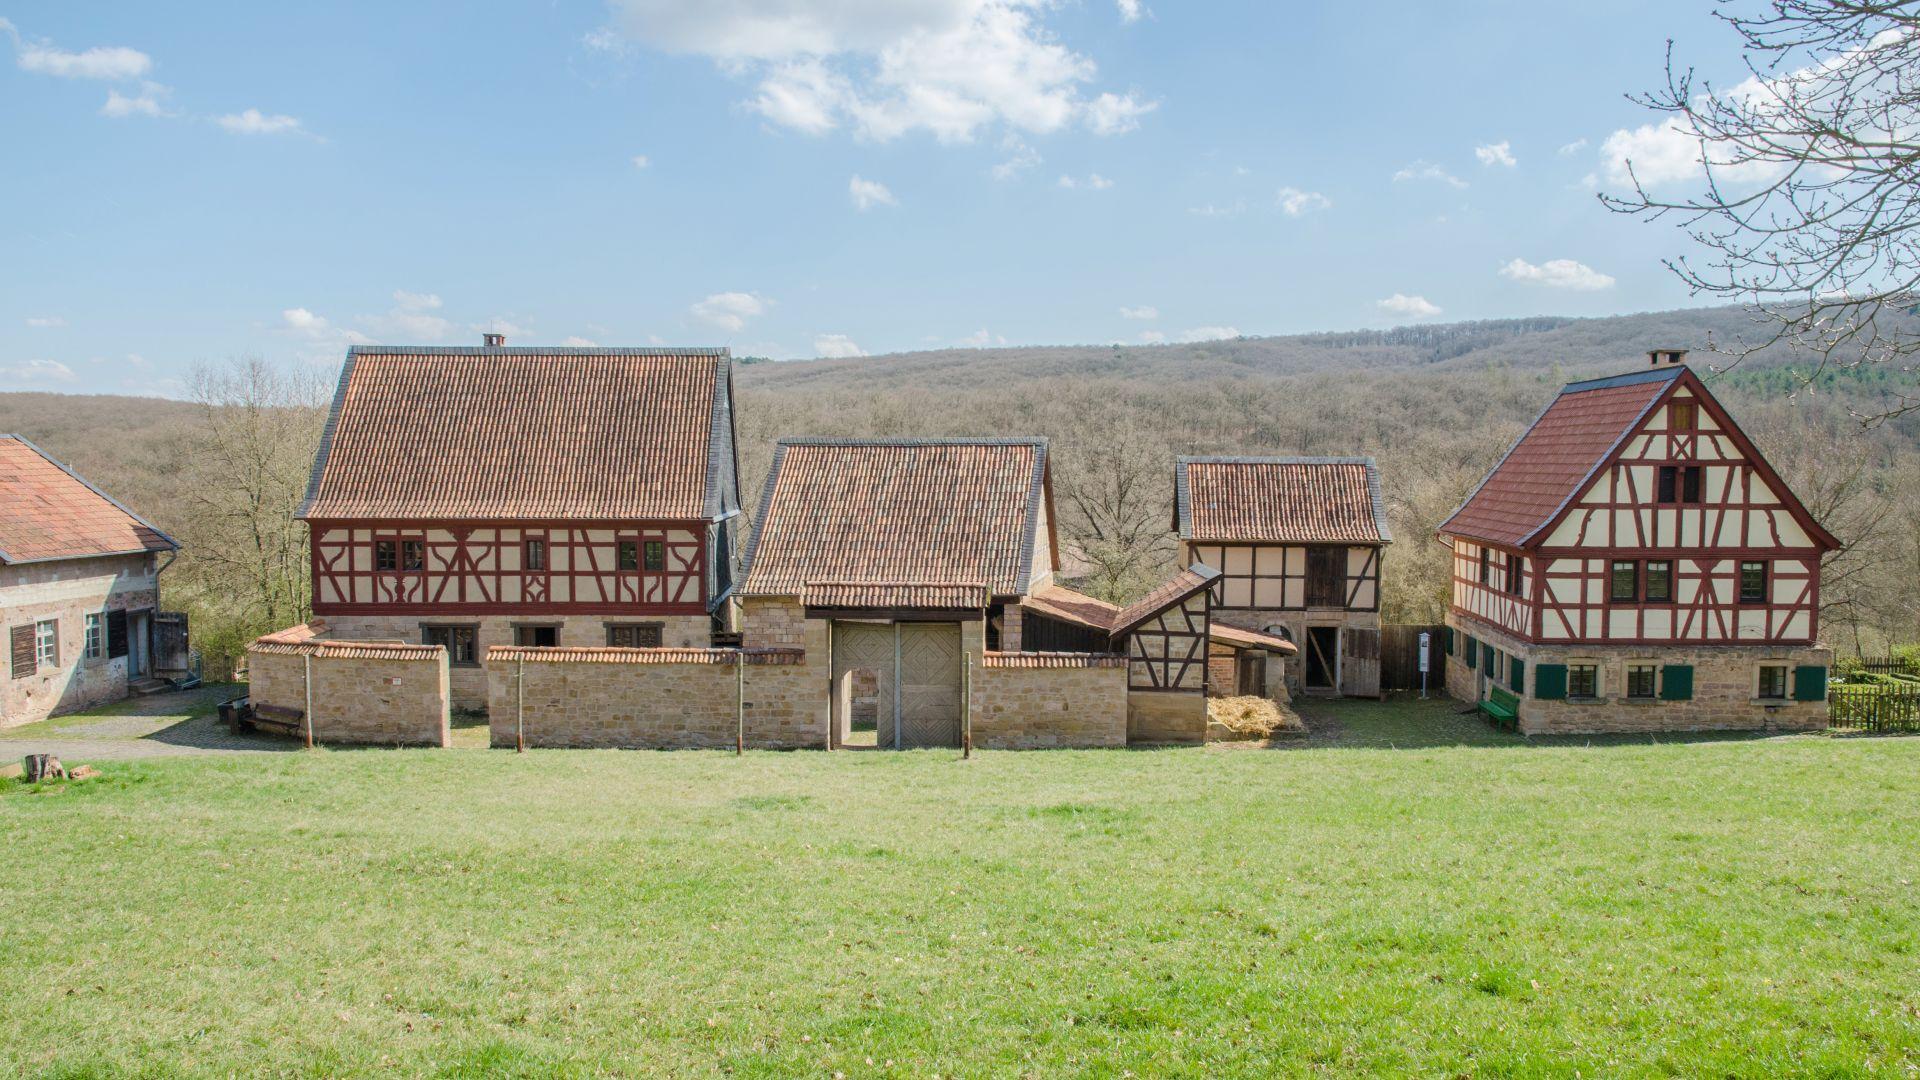 Bad Sobernheim: historic farms in the Bad Sobernheim open-air museum